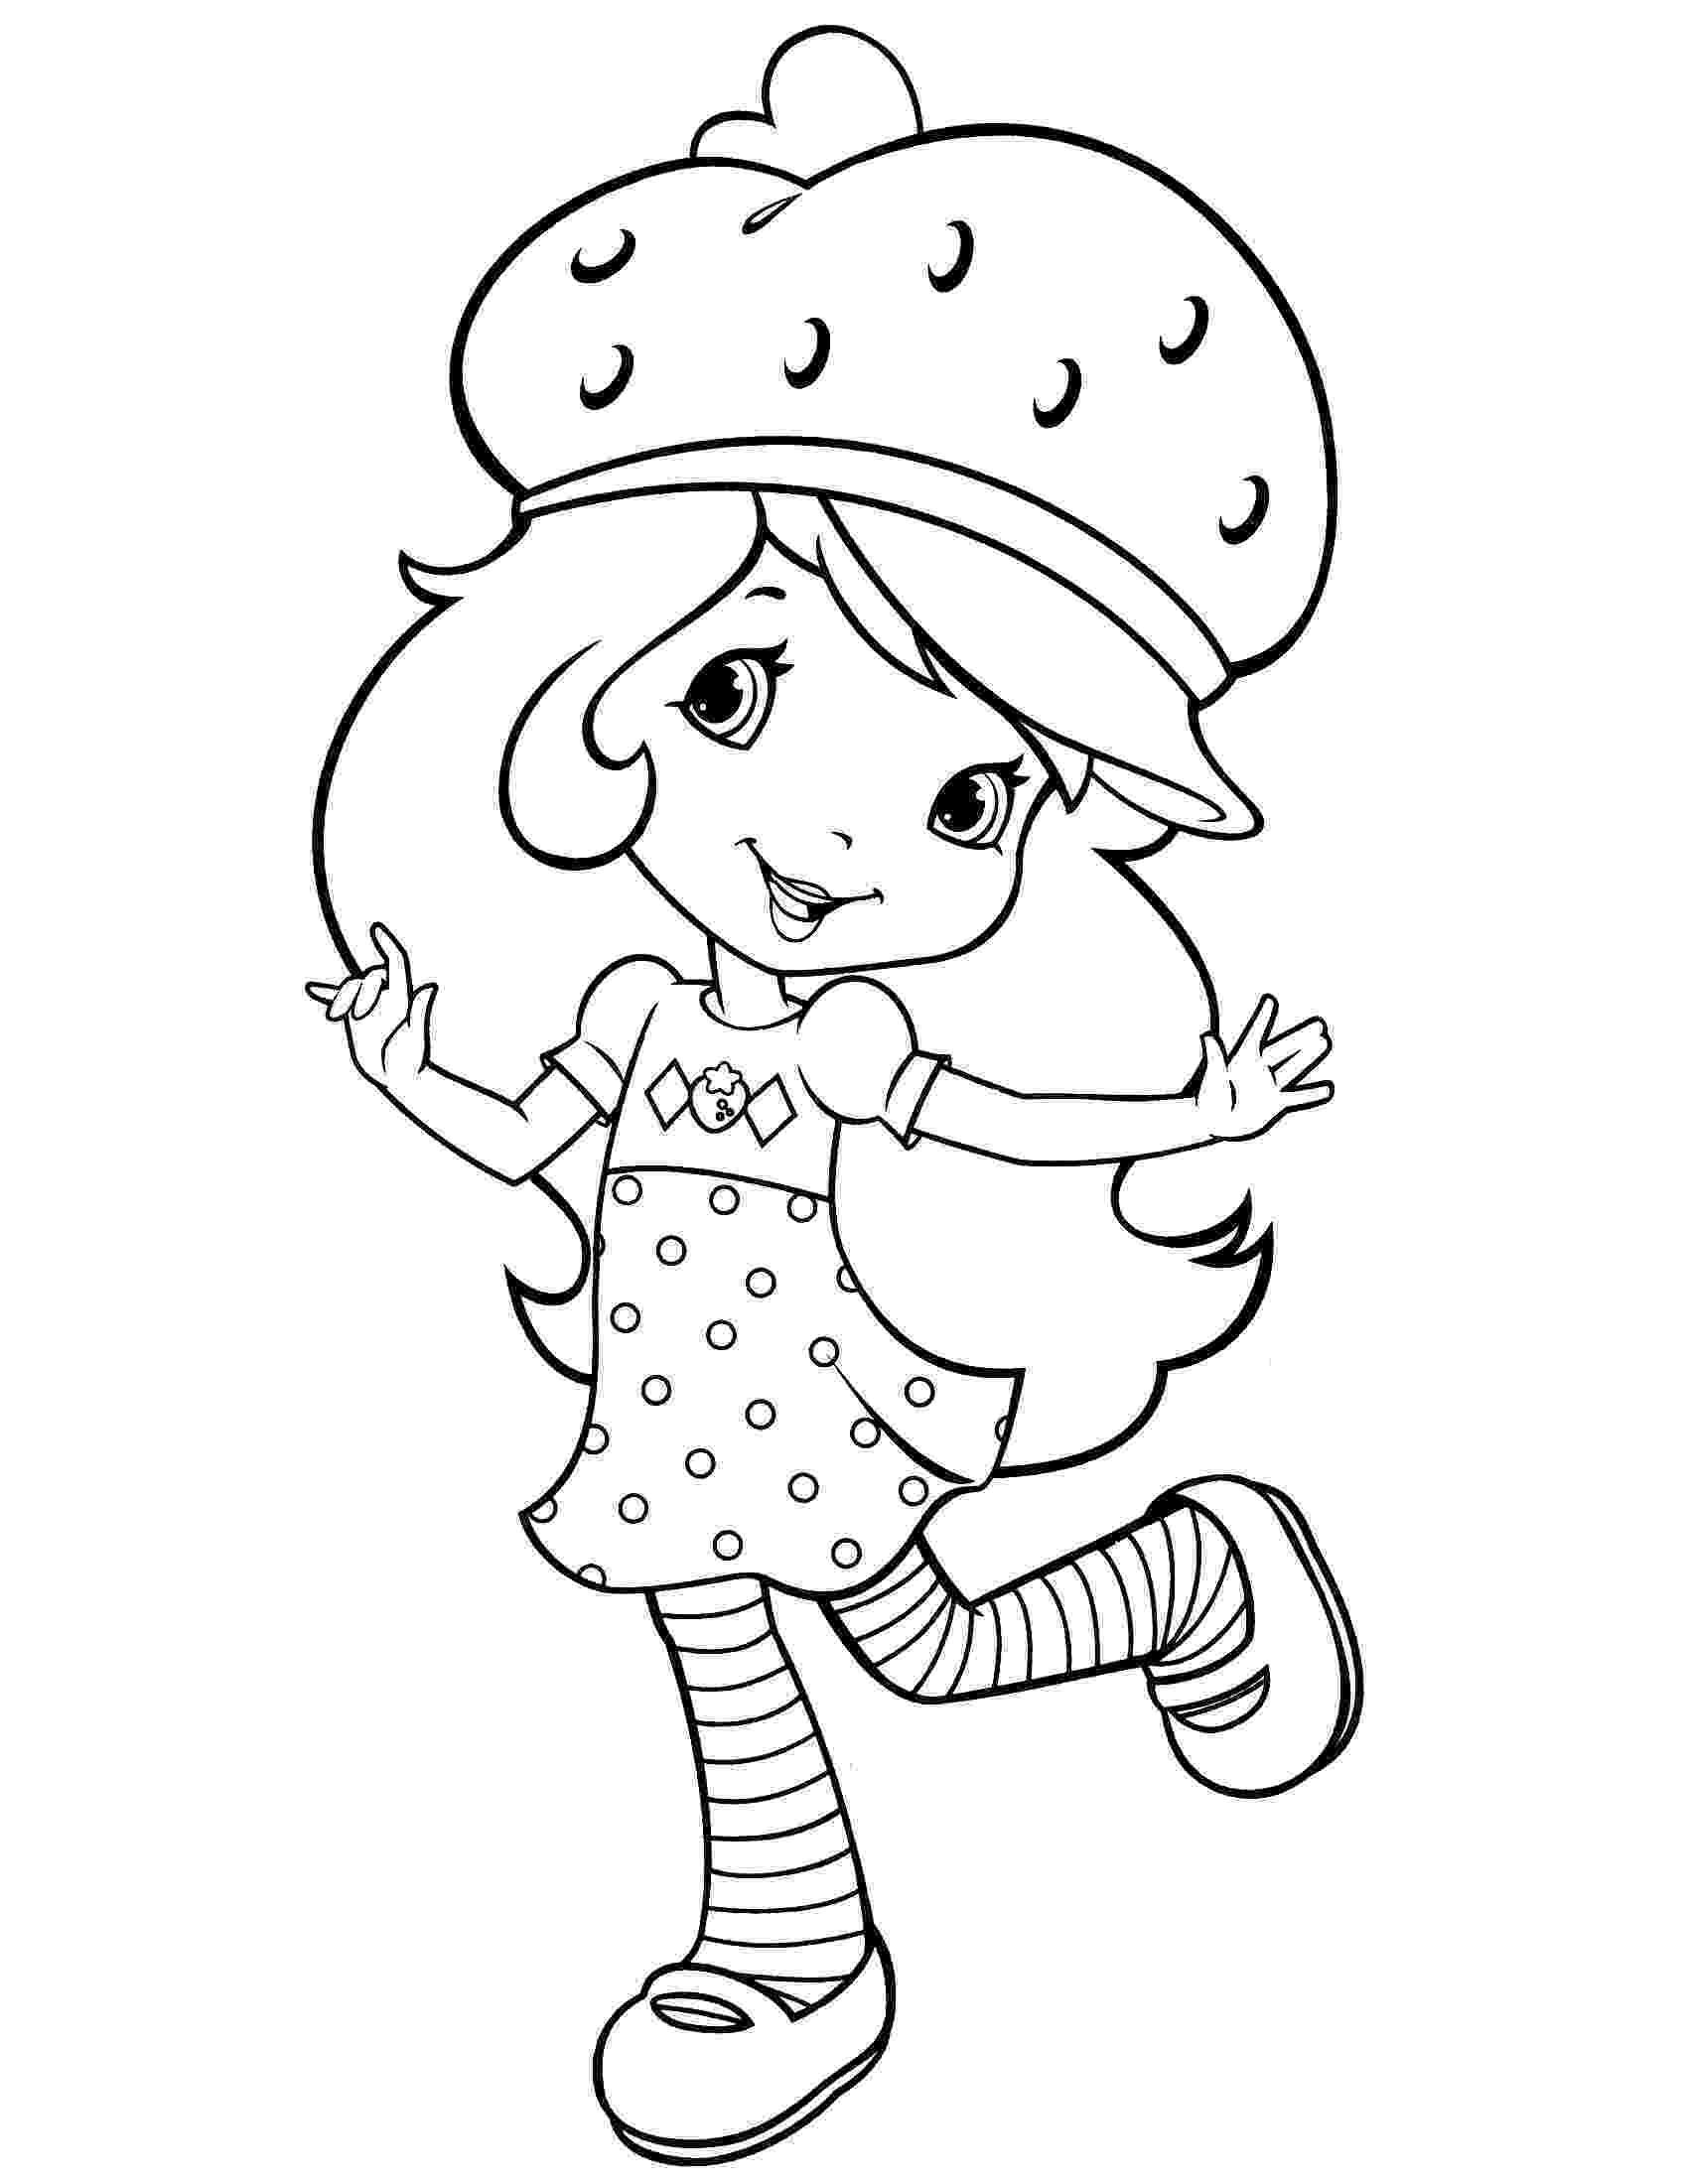 strawberry shortcake coloring page printable coloring pages strawberry shortcake coloring pages strawberry page shortcake coloring